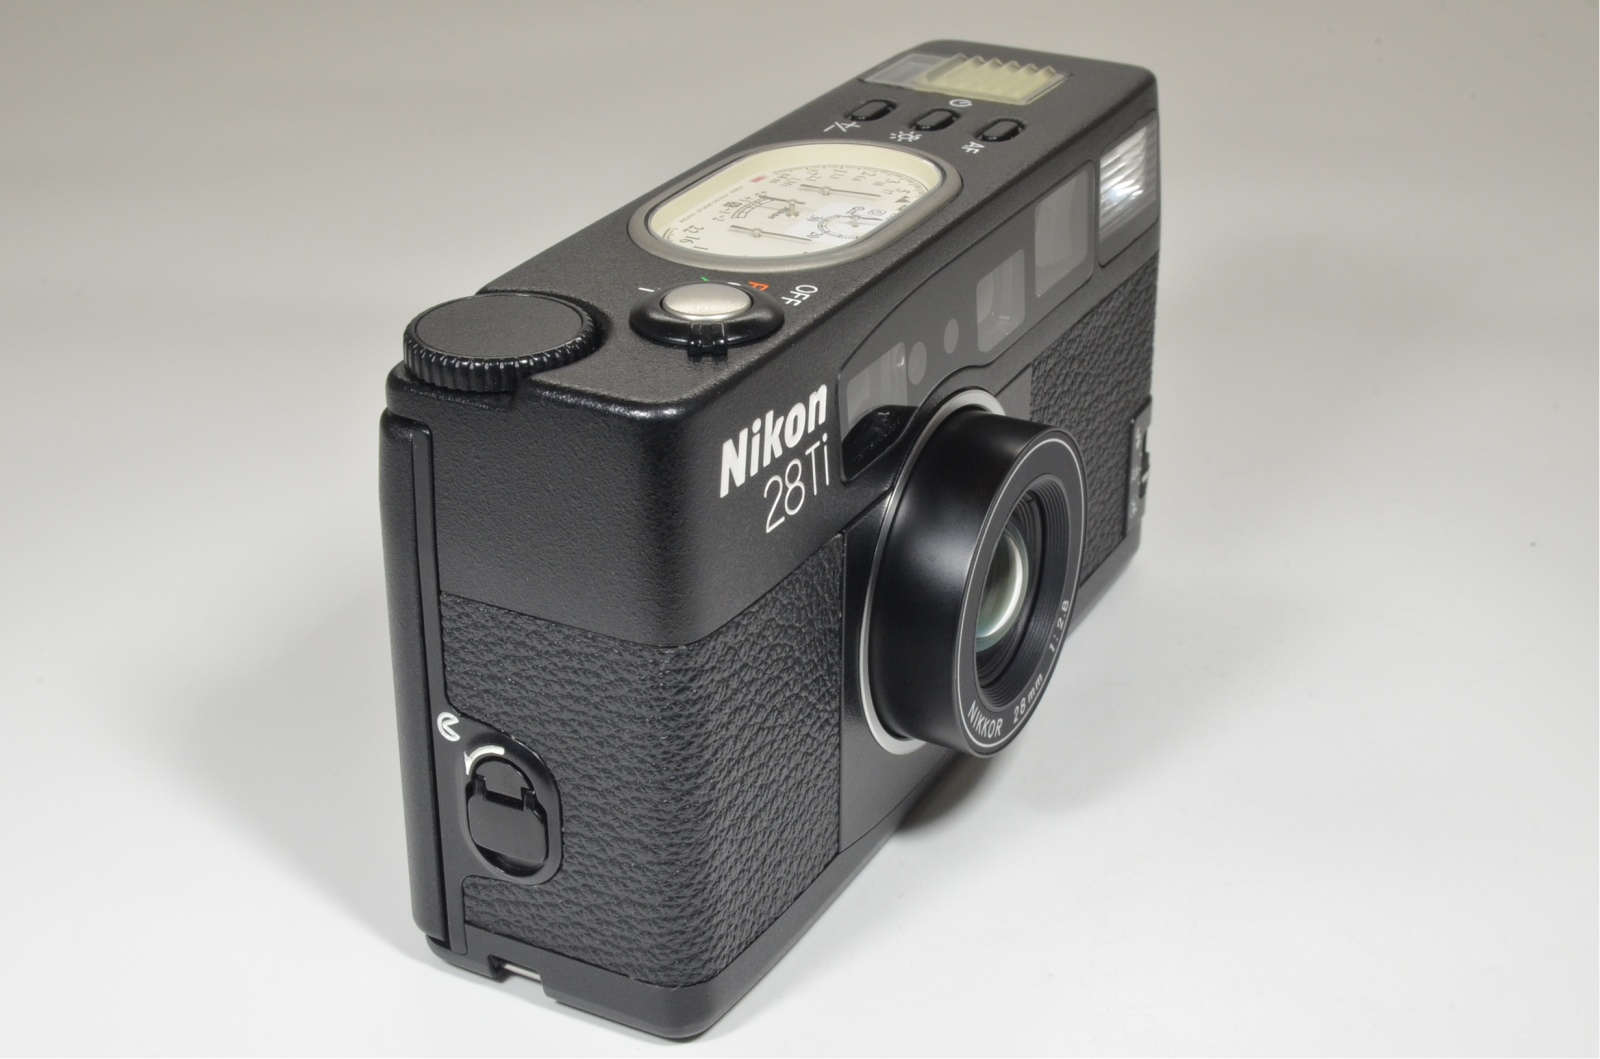 nikon 28ti point & shoot 35mm film camera lens 28mm f2.8